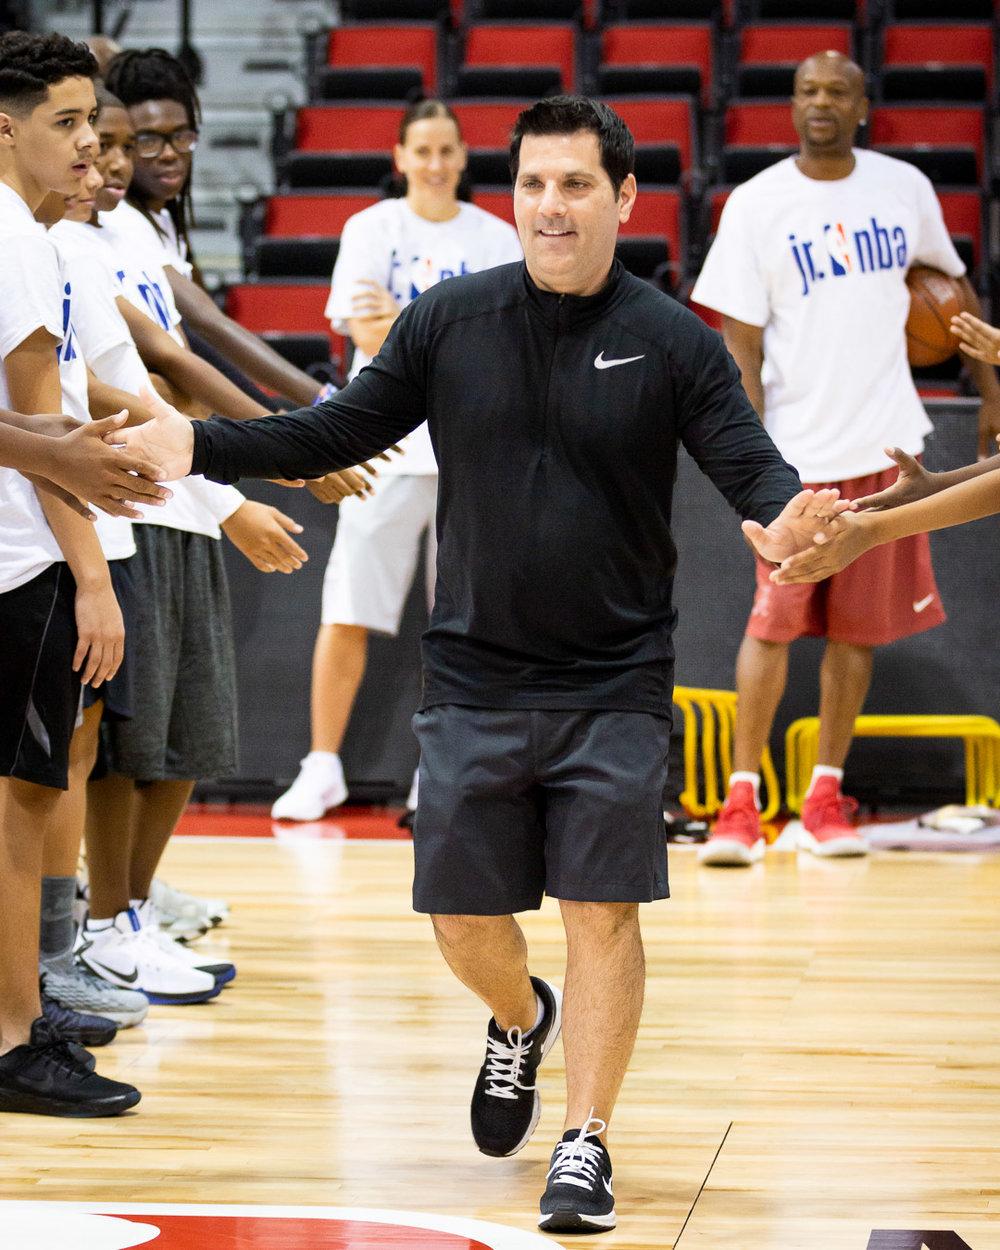 Mike Longabardi, Assistant Coach, Cleveland Cavaliers